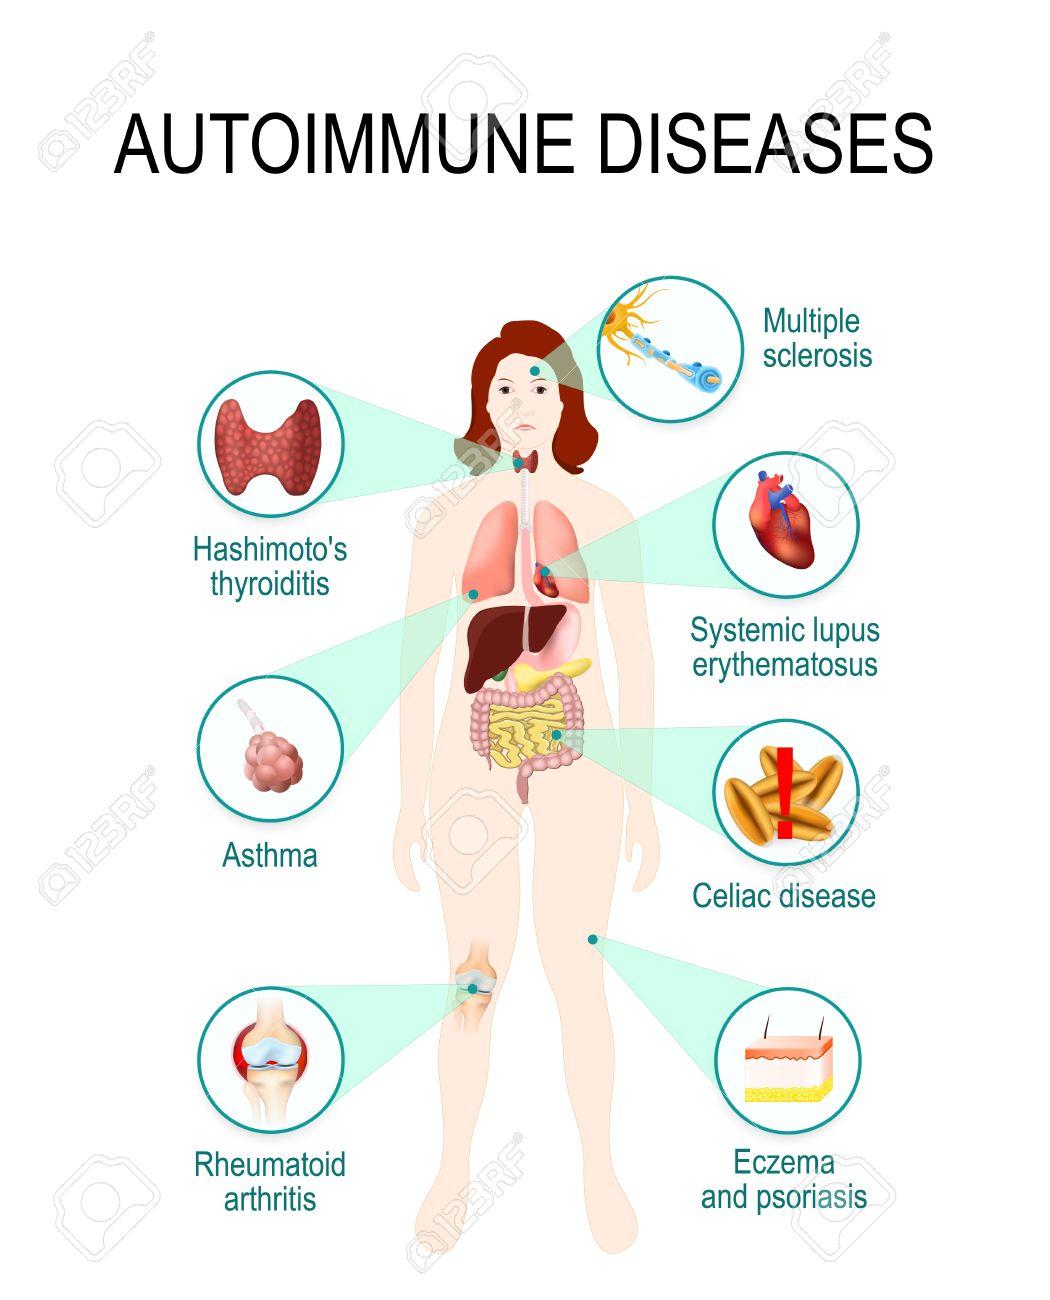 Maladies Auto Immunes Tissus Du Corps Humain Affectes Par Une